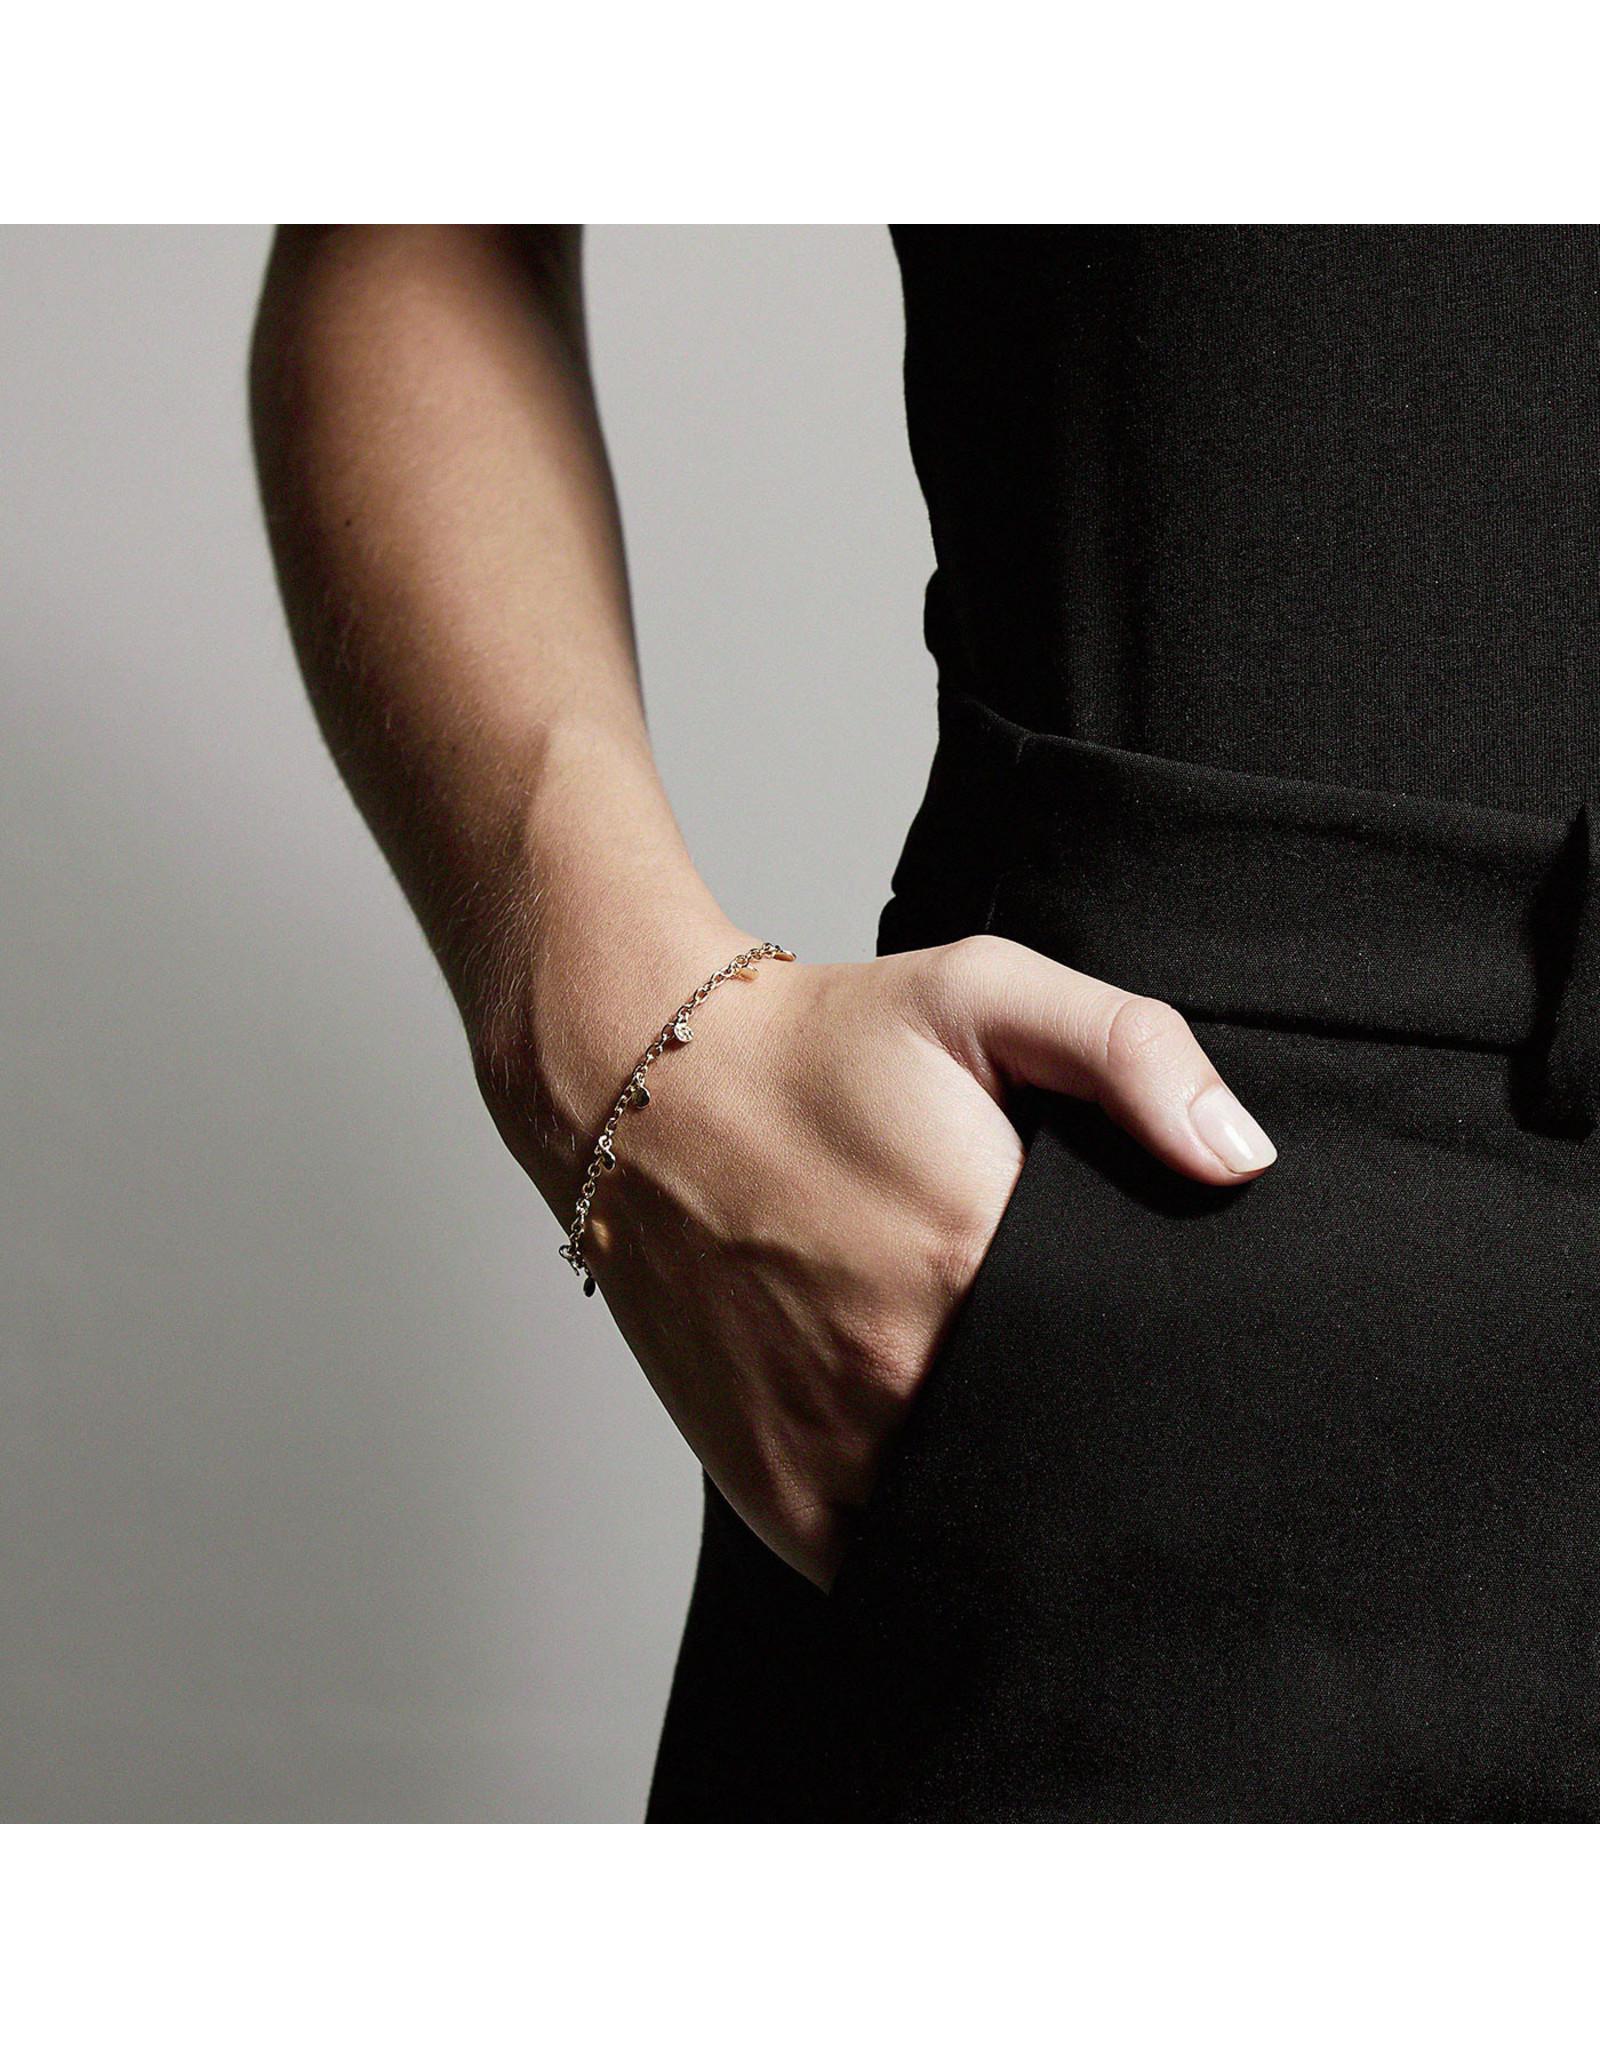 Pilgrim - Panna Bracelet (Gold & Silver)